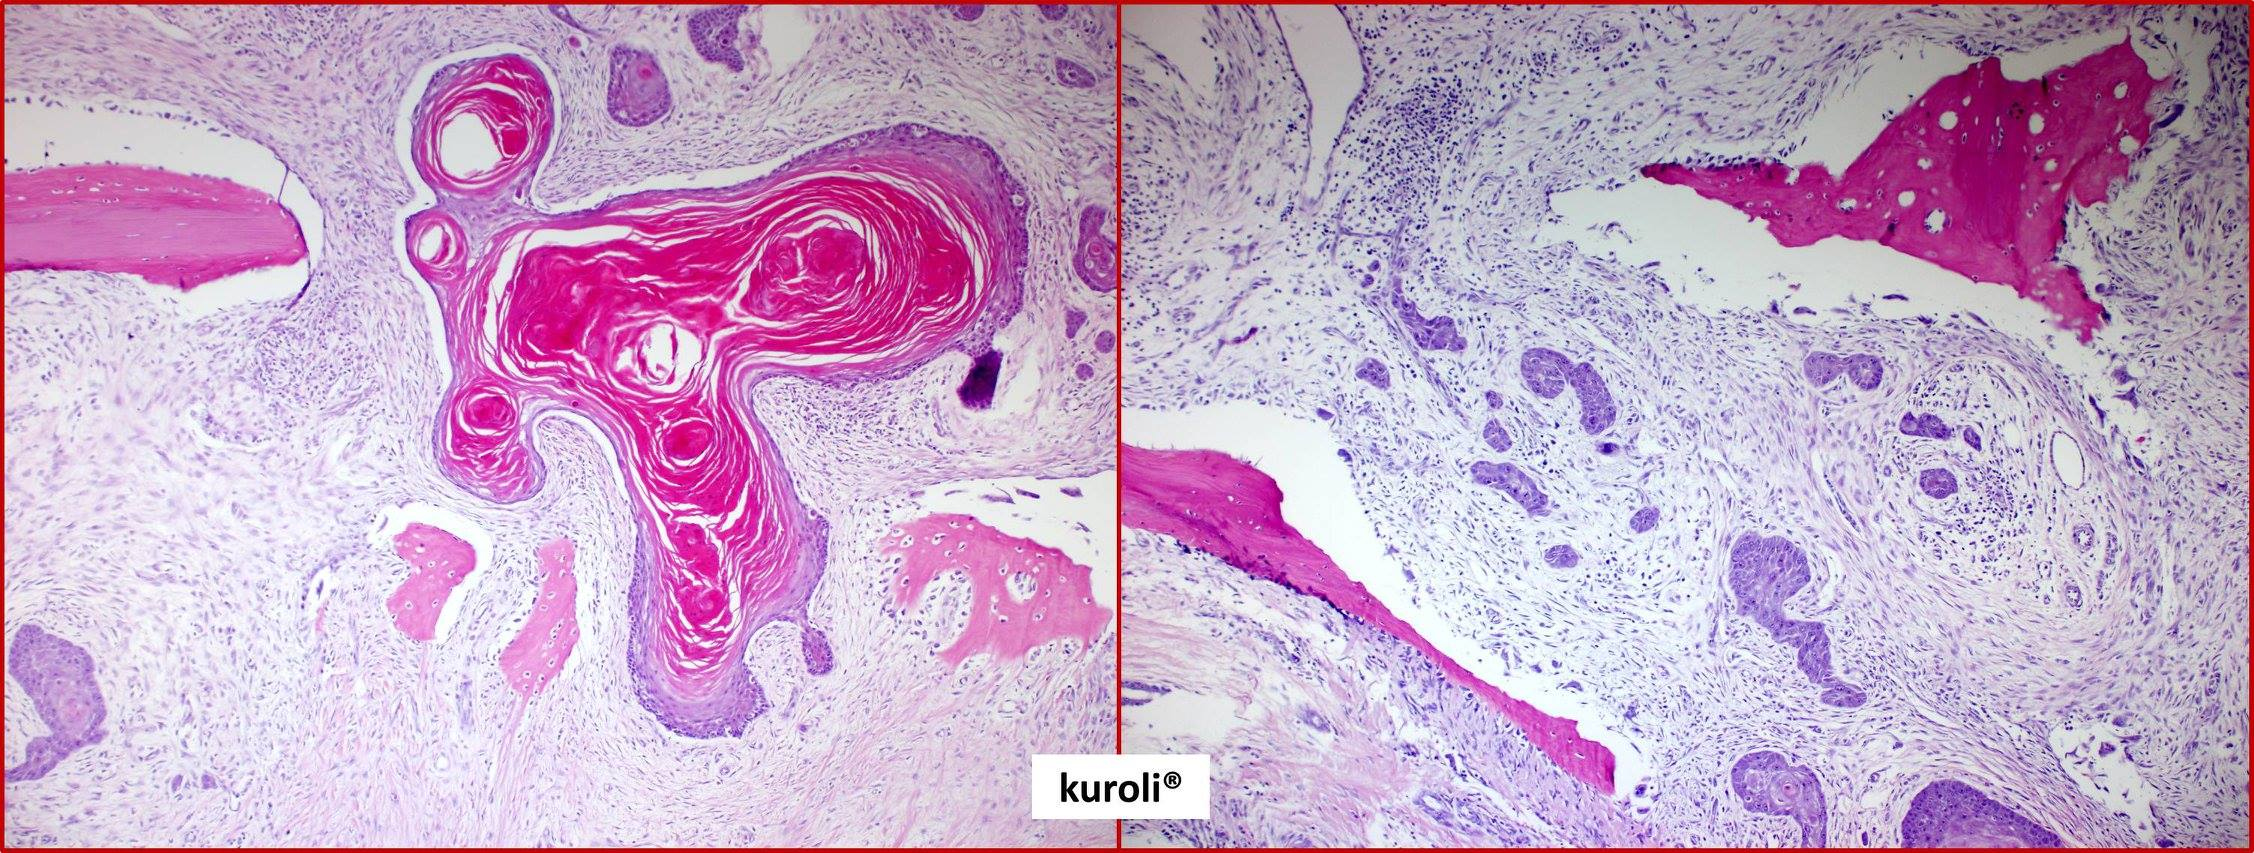 papillomatosis bőrpatológia